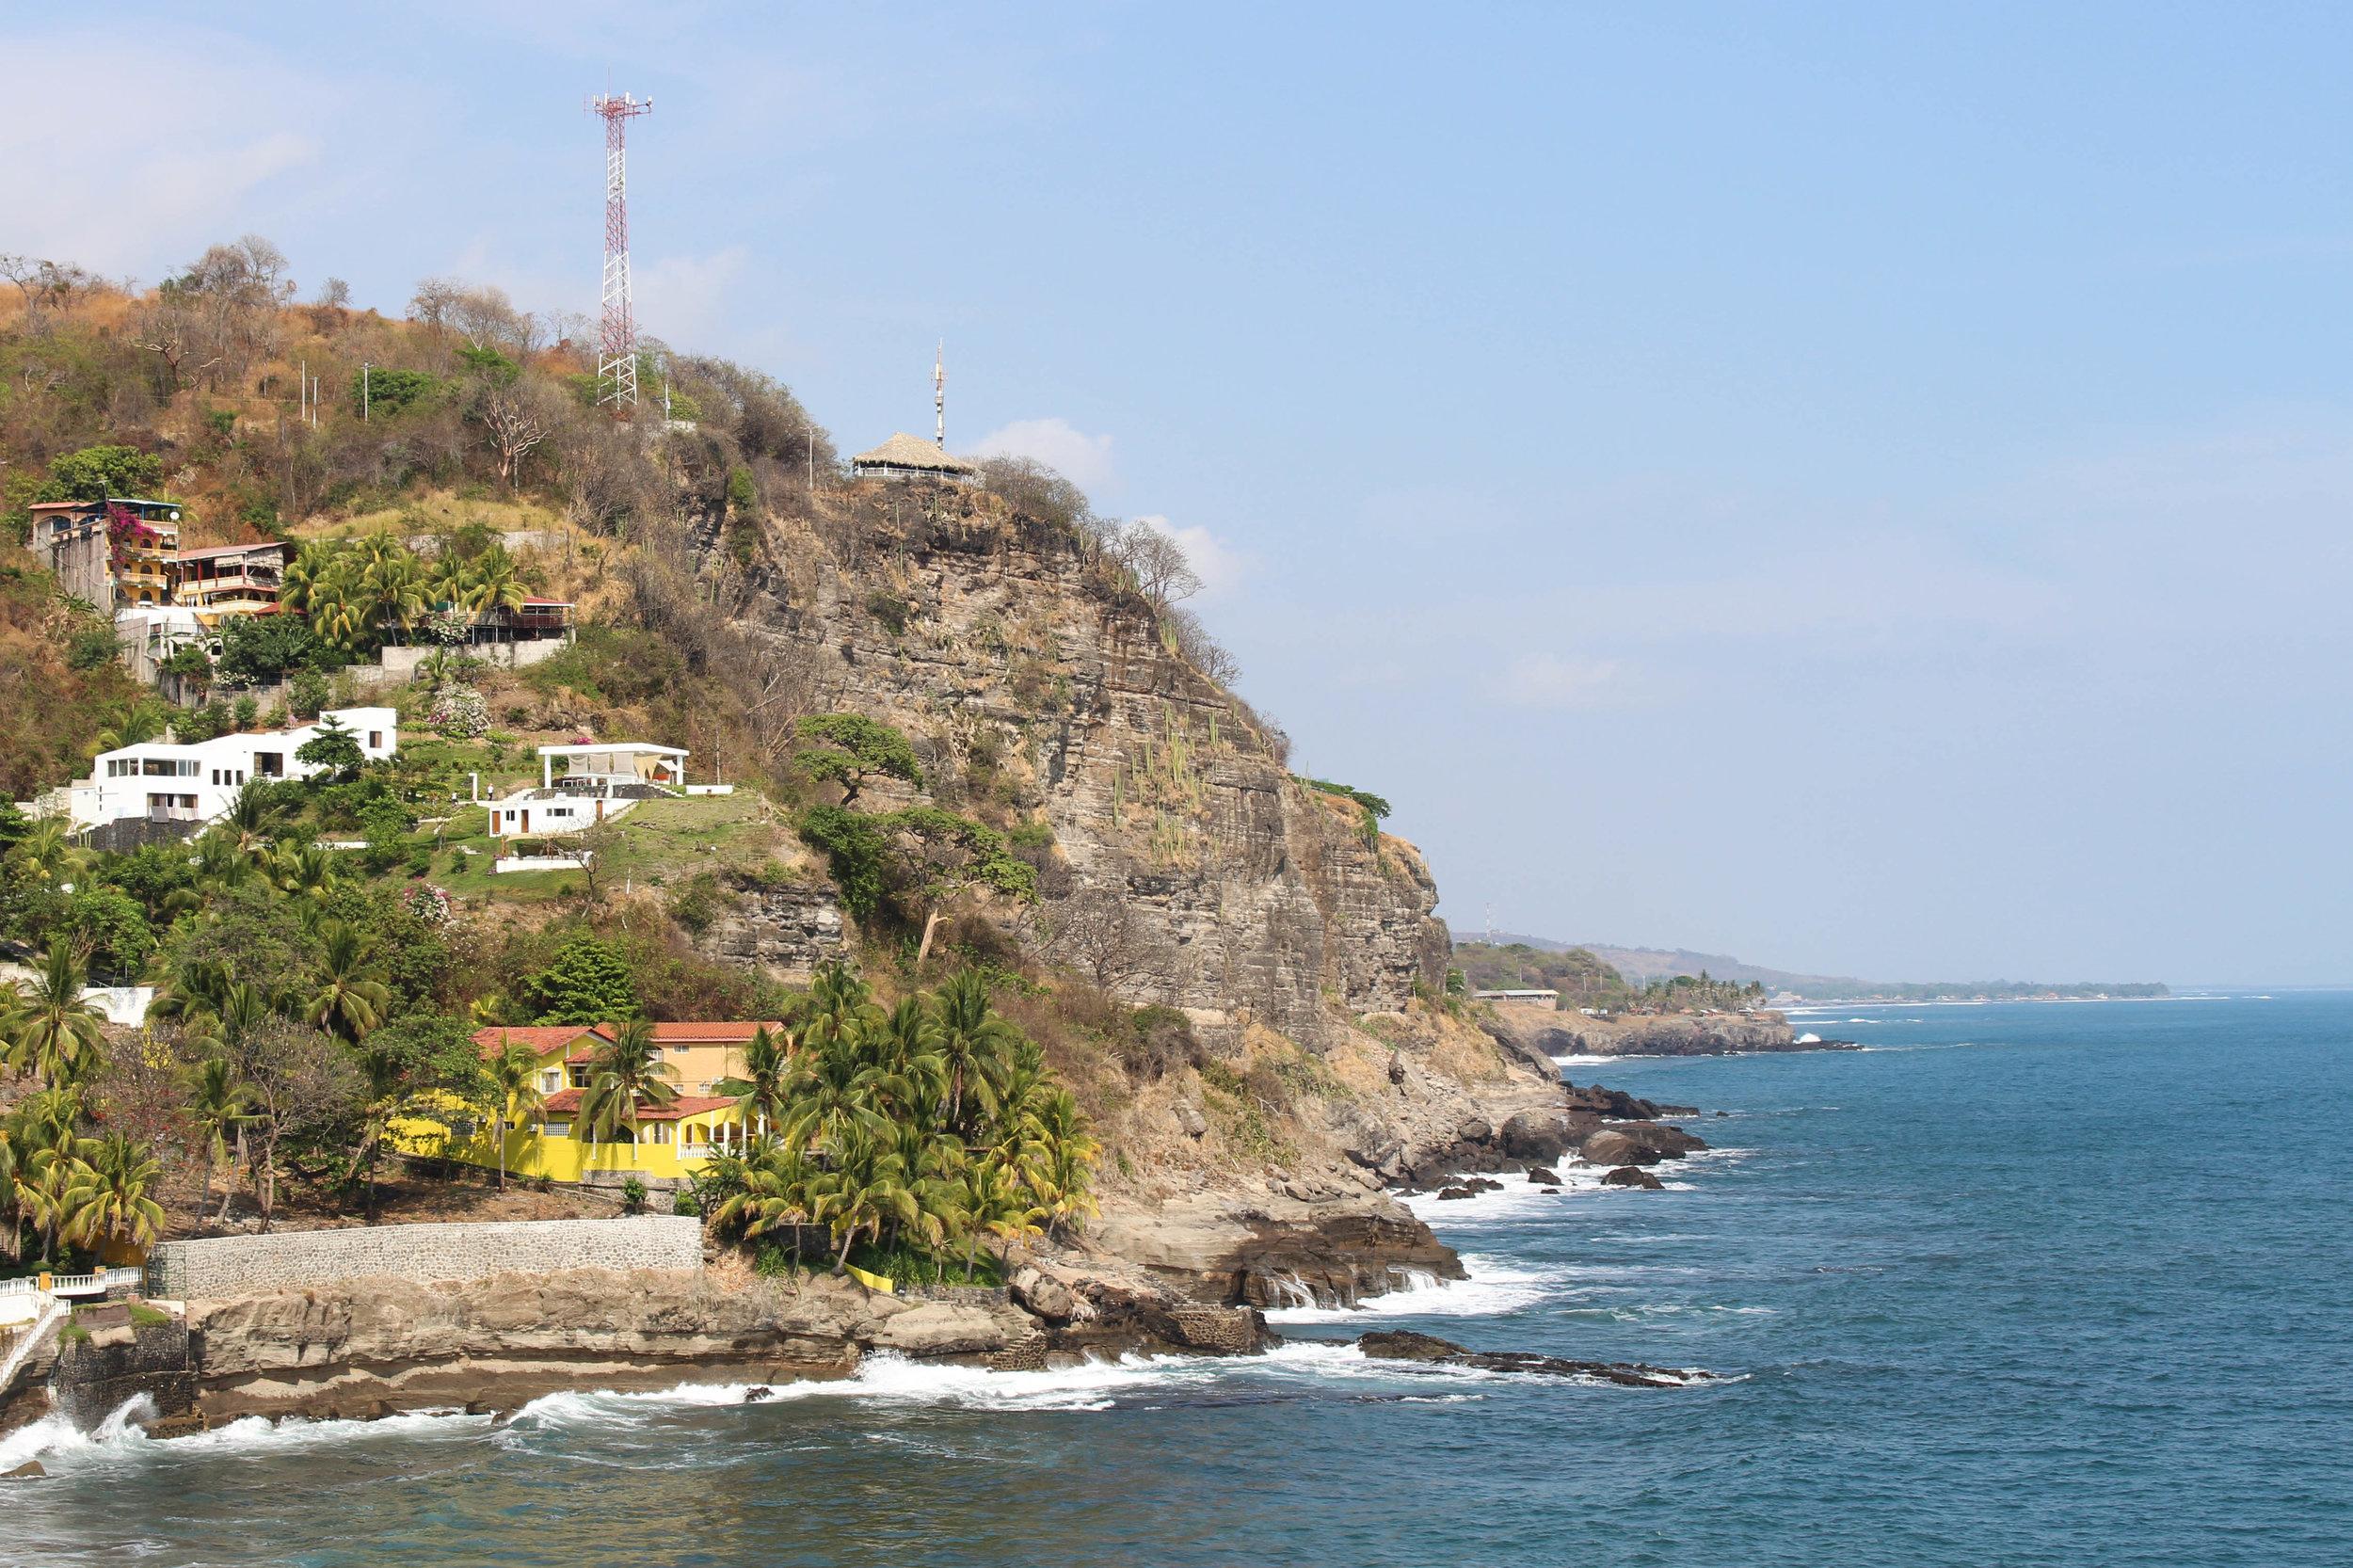 El tunco- day view (hill) croped-natalienehlawi.jpg